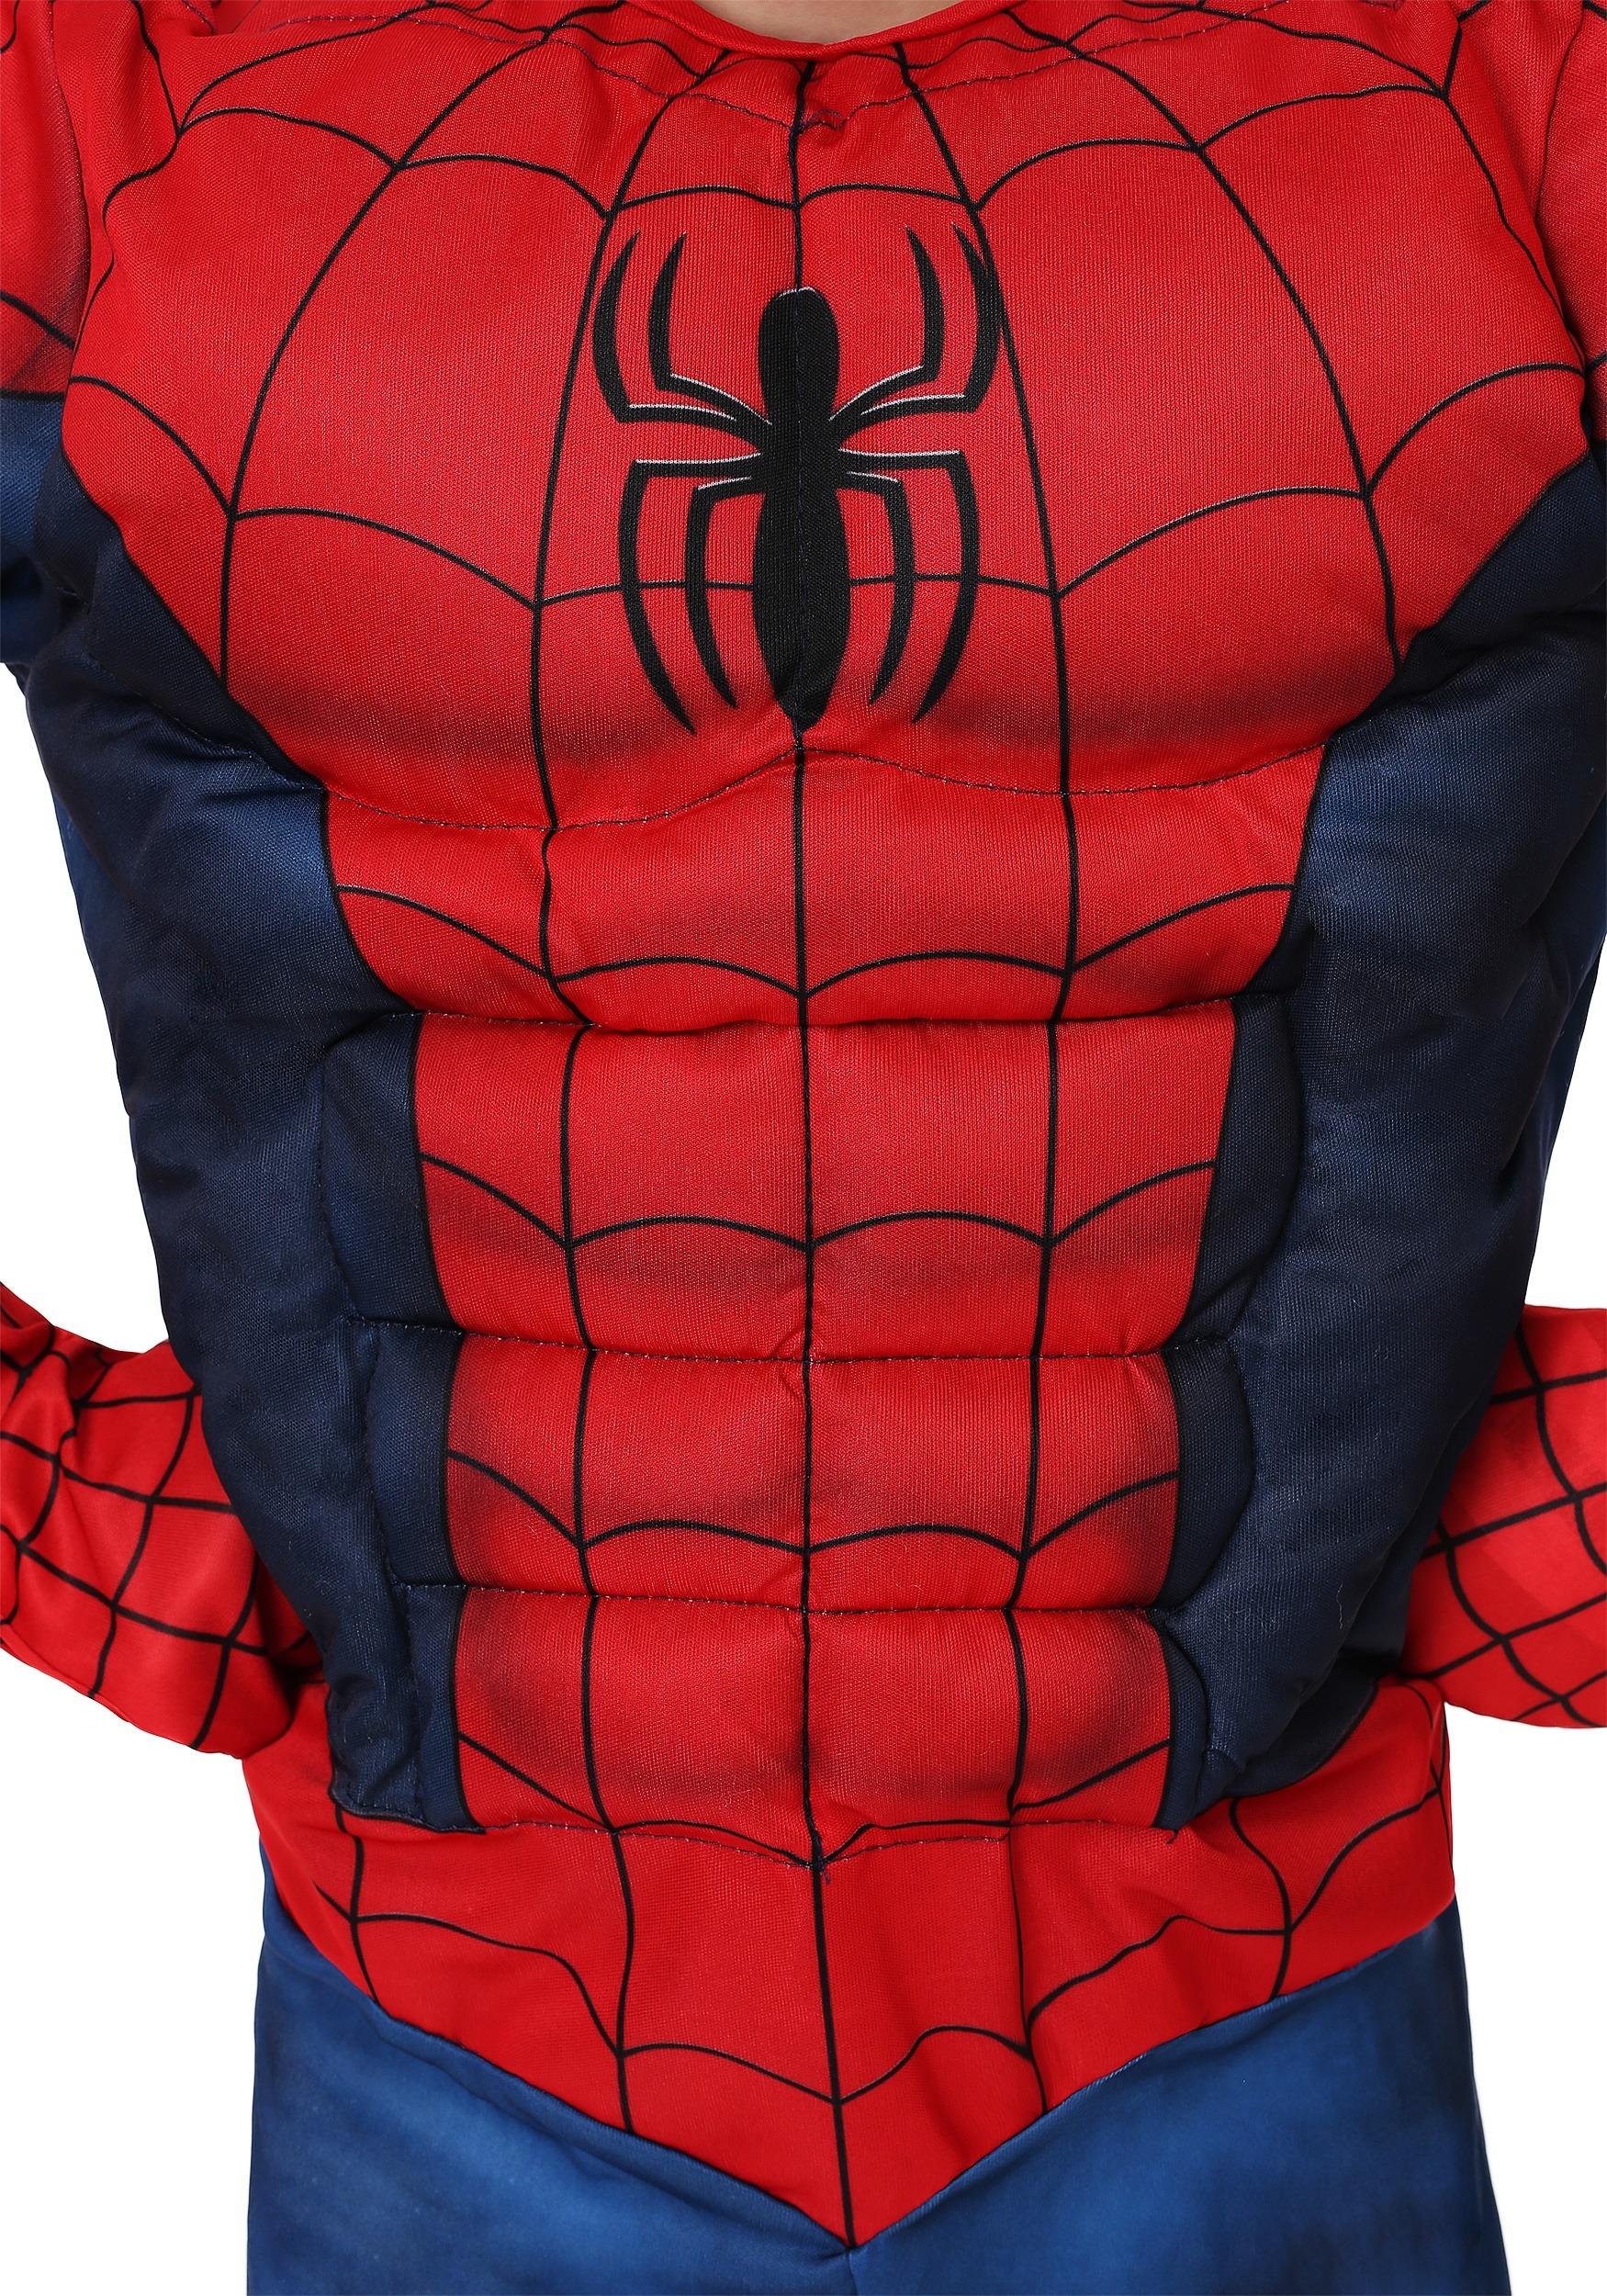 ... Marvel Spider Man Toddler Costume3 ...